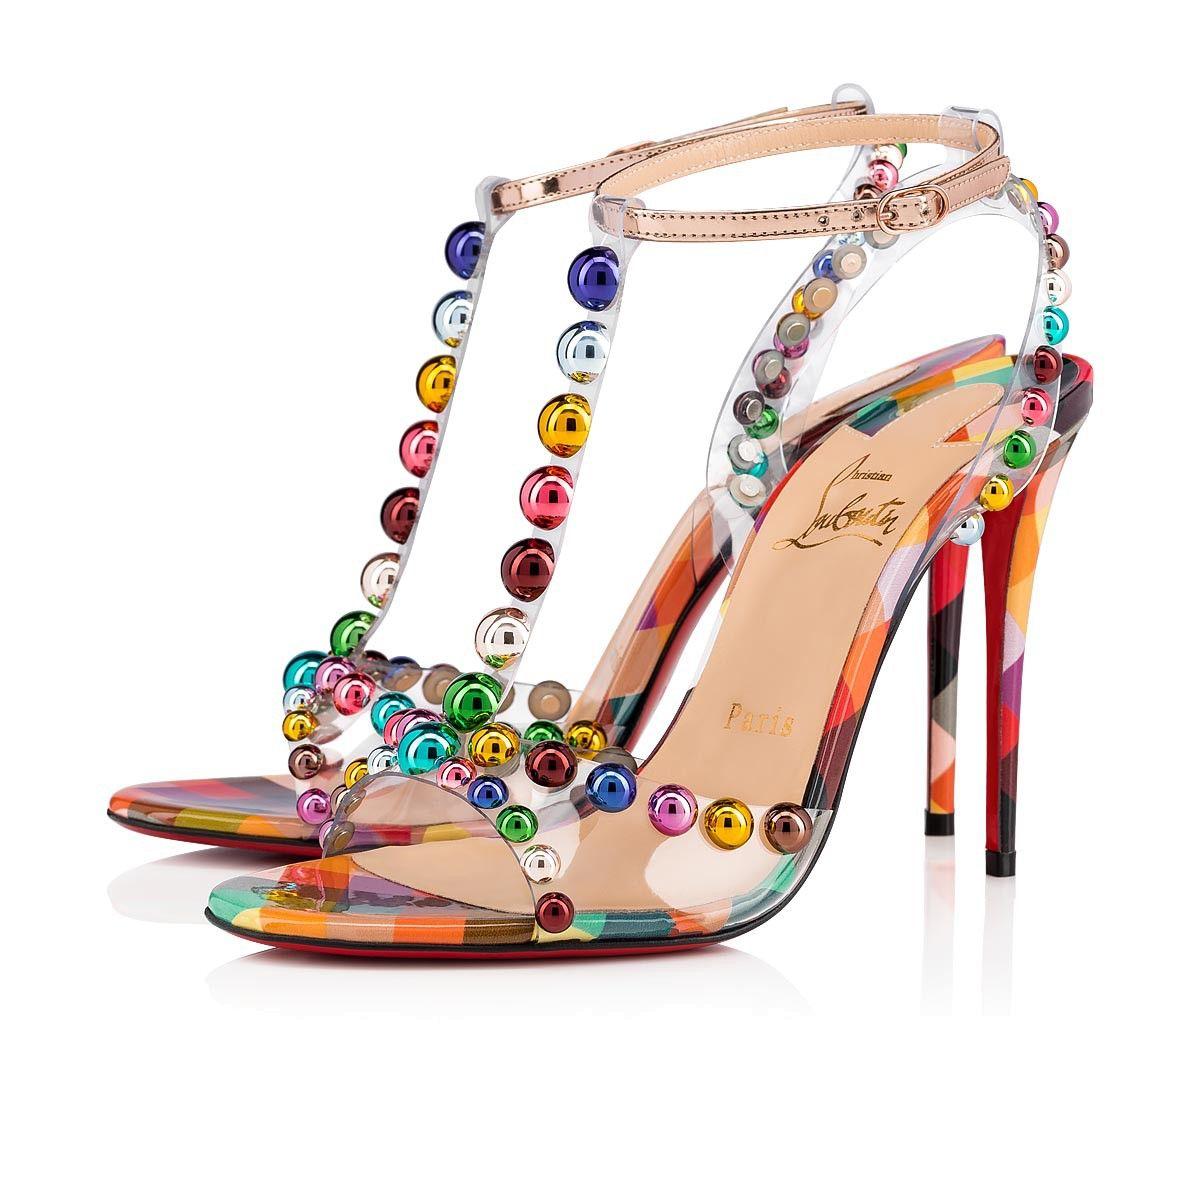 bfc32cb4a75a Faridaravie 100 Version Multi Patent Cinestripes - Women Shoes - Christian  Louboutin